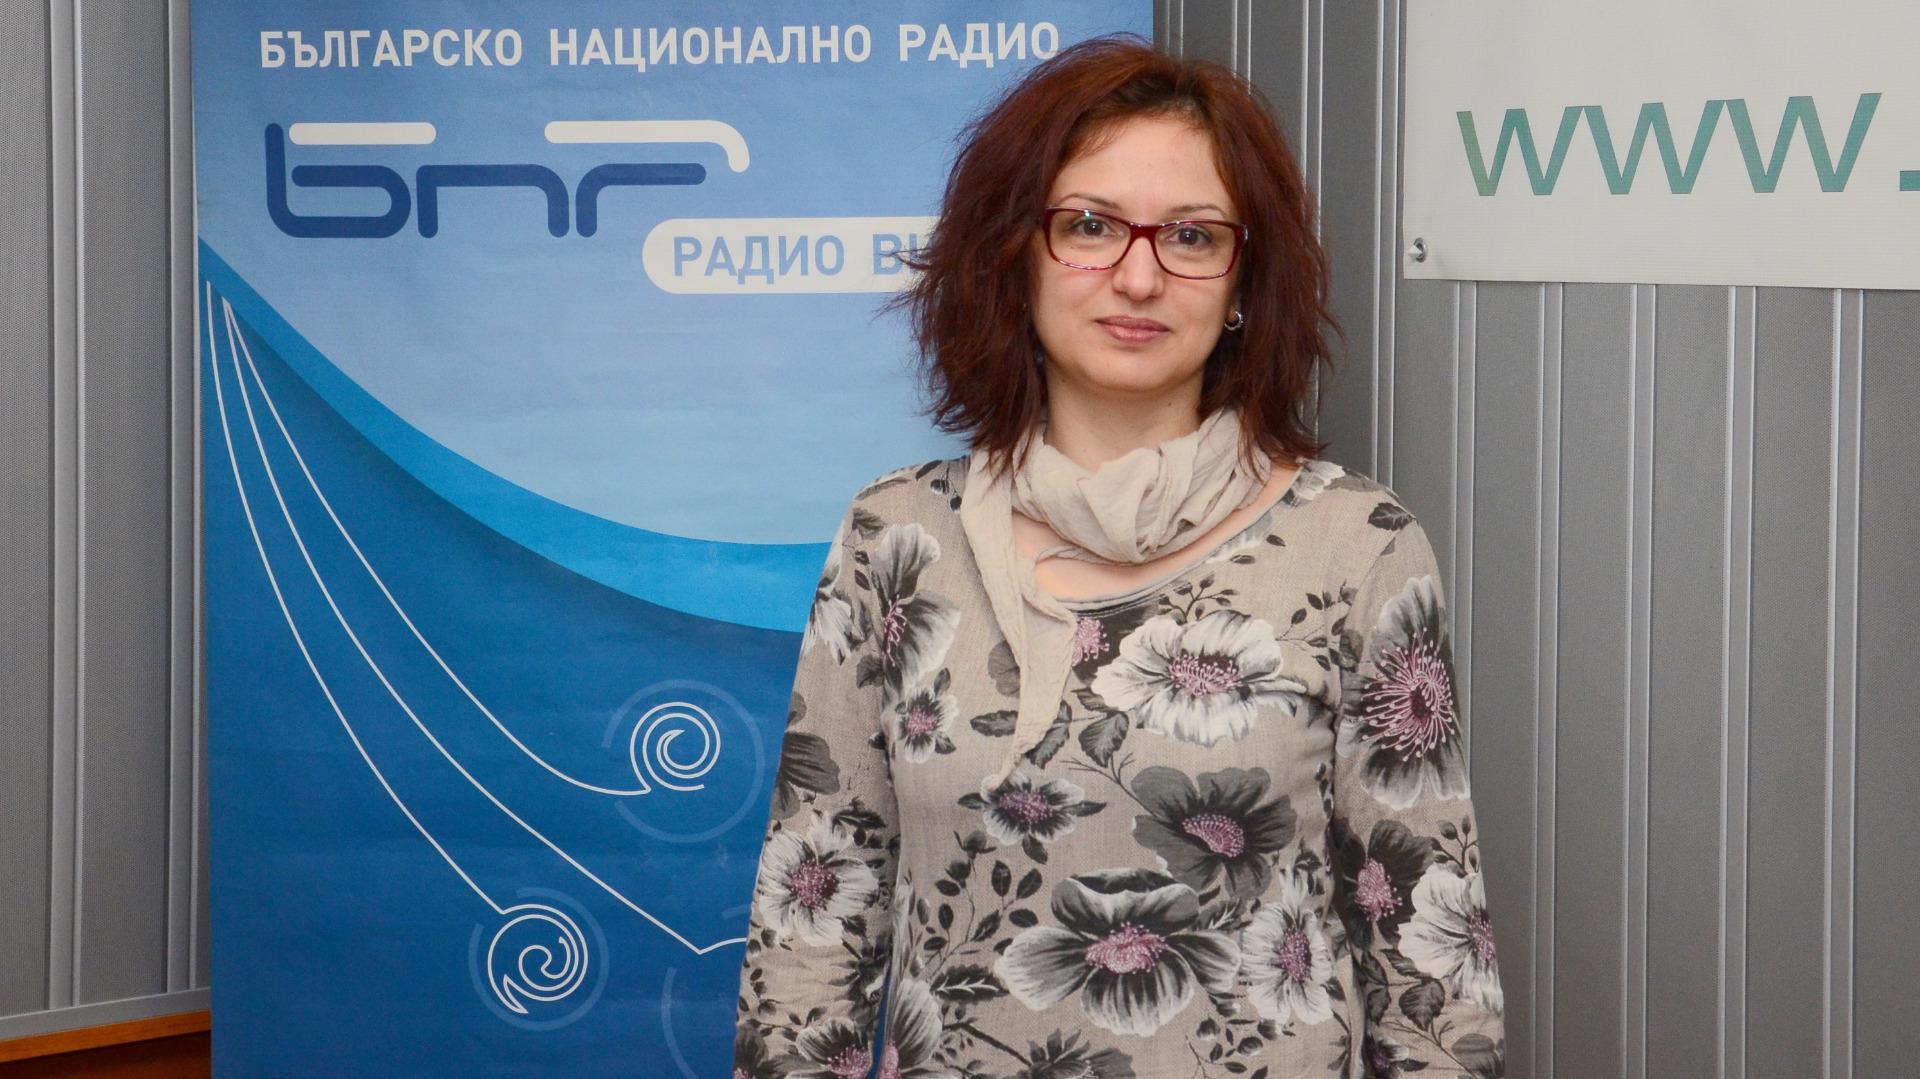 Д-р Ели Папавасилиу, невролог и заместник директор на МБАЛ